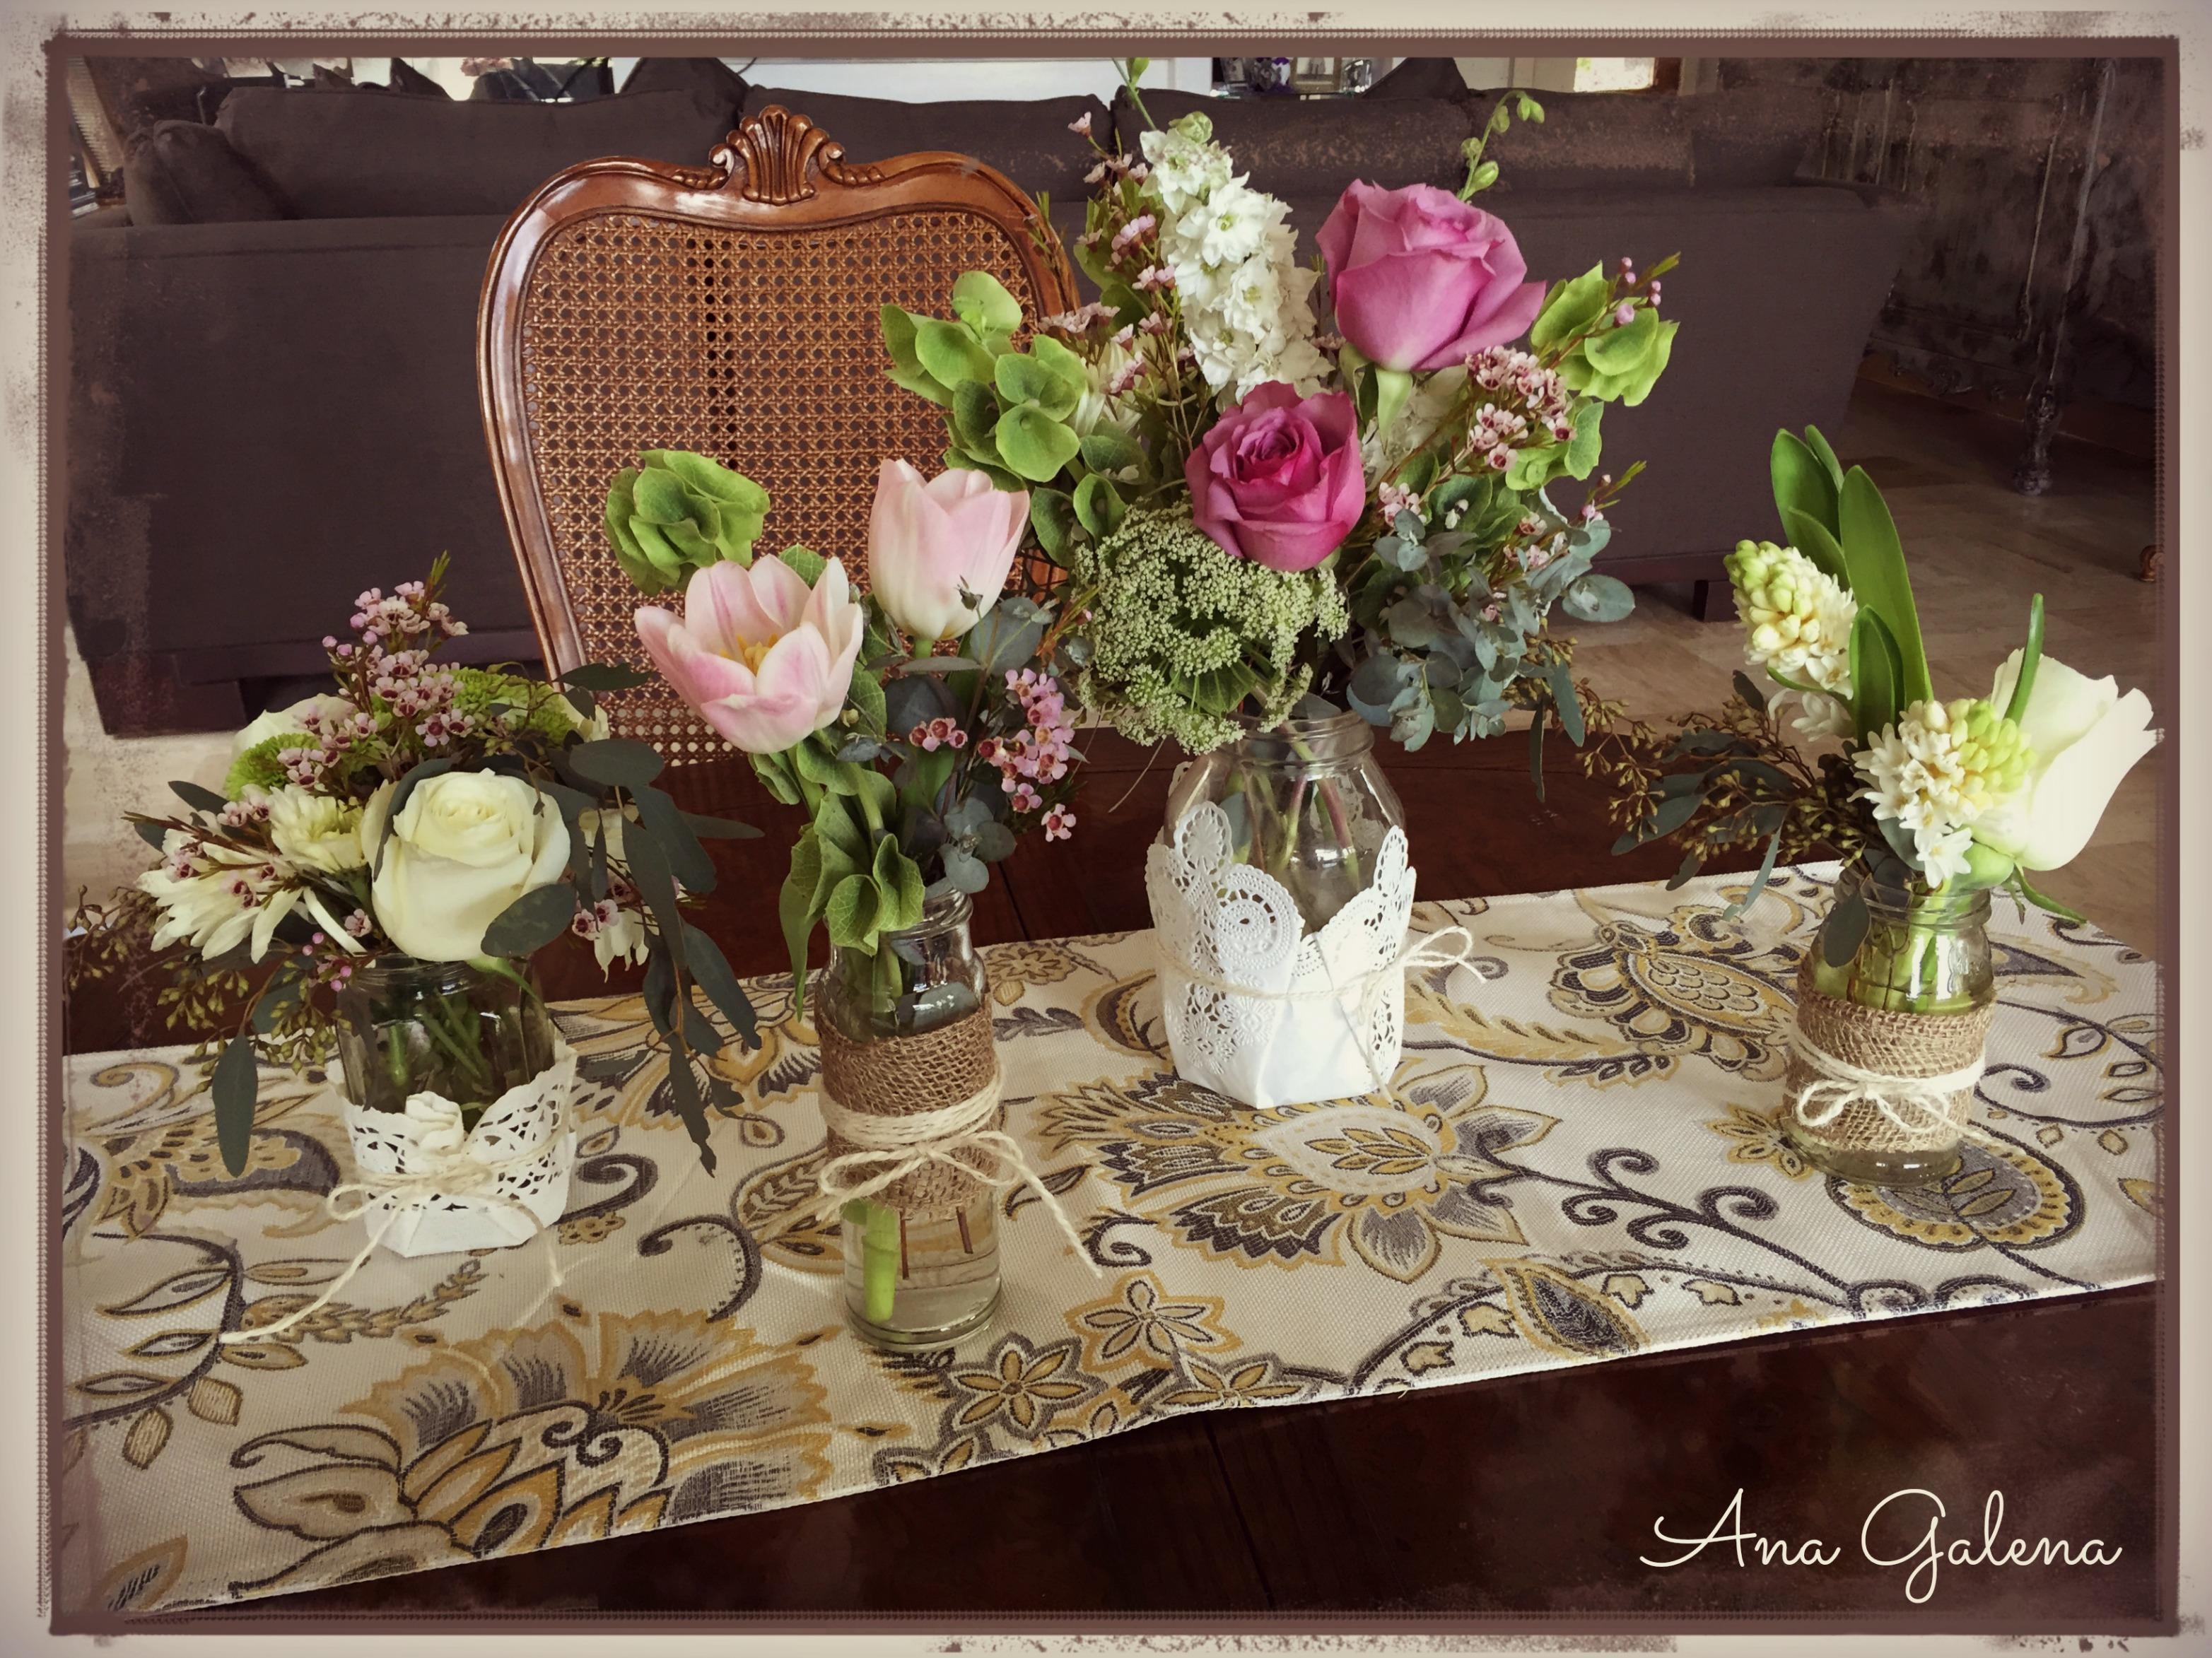 Centro de mesa en frascos estilo vintage ana galena - Decorar mesas para eventos ...